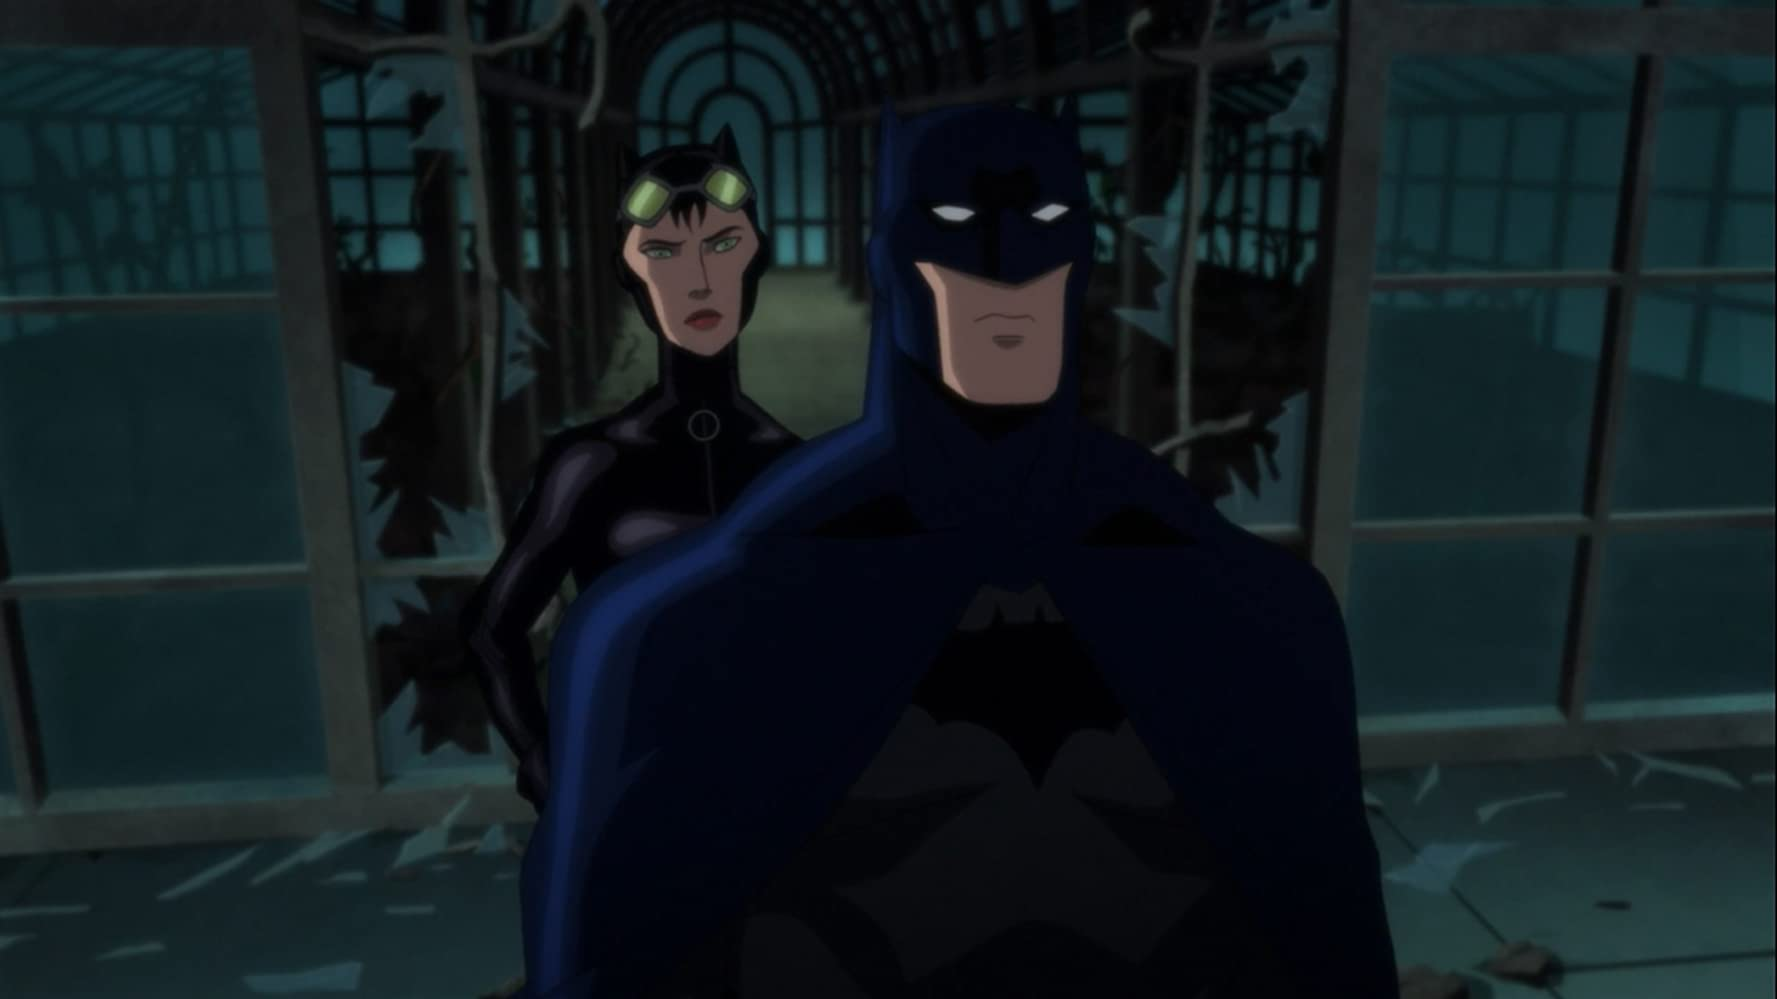 FILM - Batman: Hush (2019)